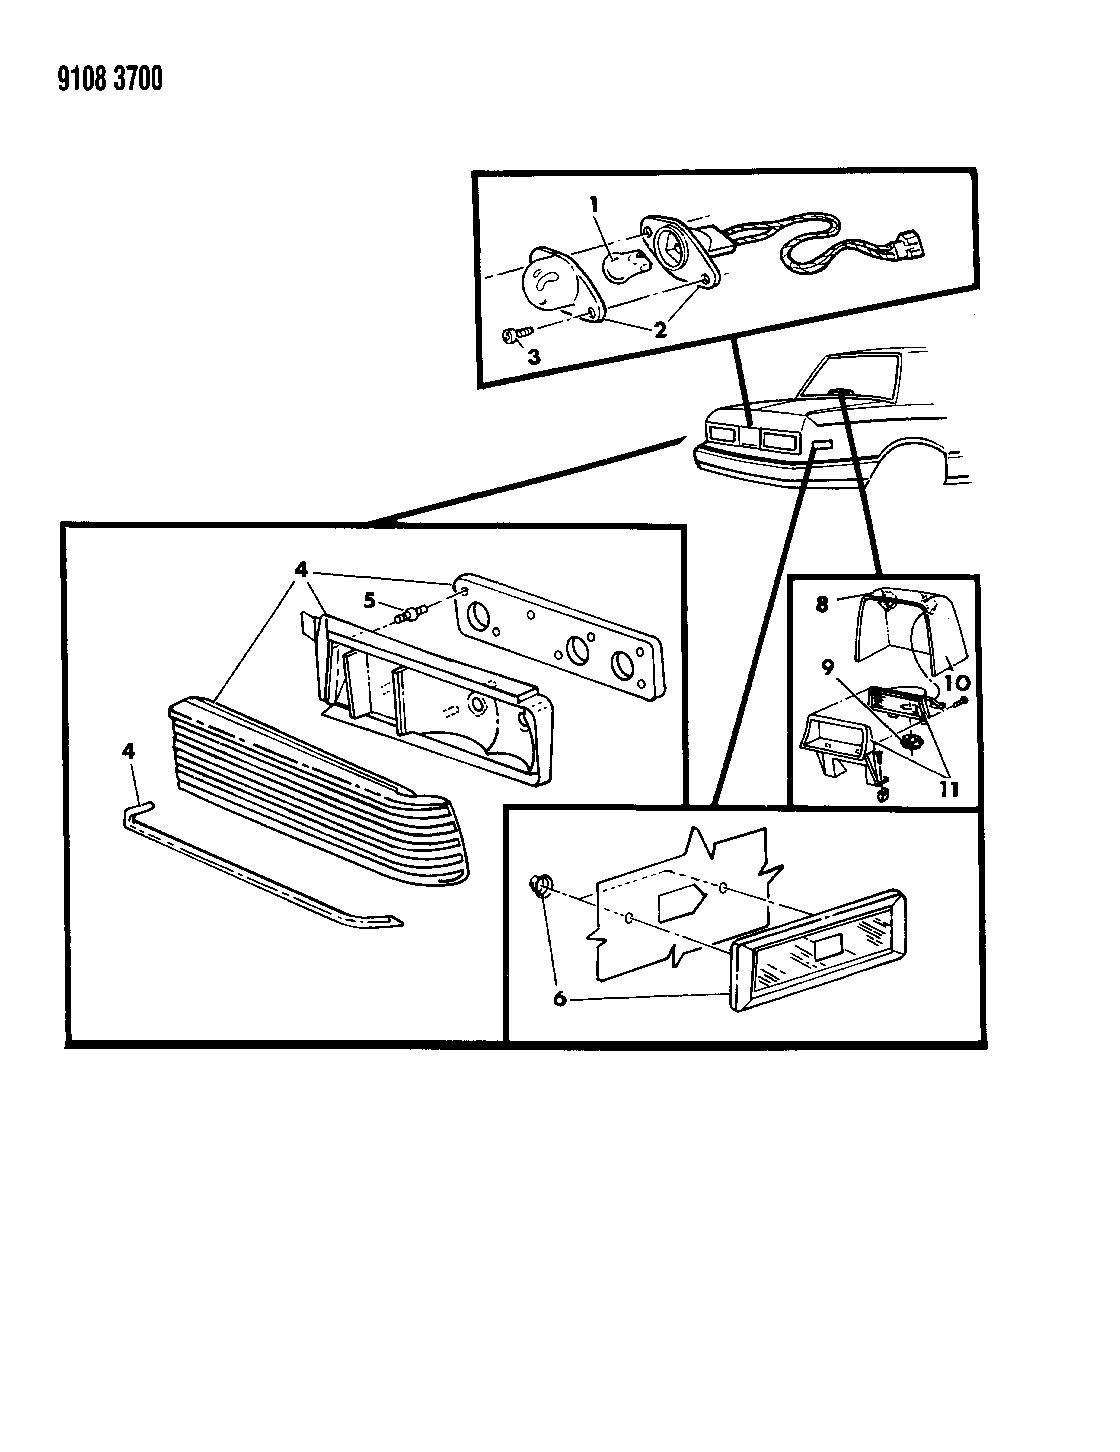 1989 Dodge Aries Lamps & Wiring - Rear - Mopar Parts Giant on amc amx wiring diagram, chrysler 300m wiring diagram, toyota truck wiring diagram, chevy astro wiring diagram, ford fairmont wiring diagram, chevy blazer wiring diagram, ford explorer sport wiring diagram, gmc van wiring diagram, geo metro wiring diagram, mazda b3000 wiring diagram, chevy suburban wiring diagram, ford aerostar wiring diagram, gmc motorhome wiring diagram, fiat 600 wiring diagram, plymouth voyager wiring diagram, pontiac fiero wiring diagram, chevy van wiring diagram, mercury zephyr wiring diagram, chrysler cirrus wiring diagram, buick park avenue wiring diagram,